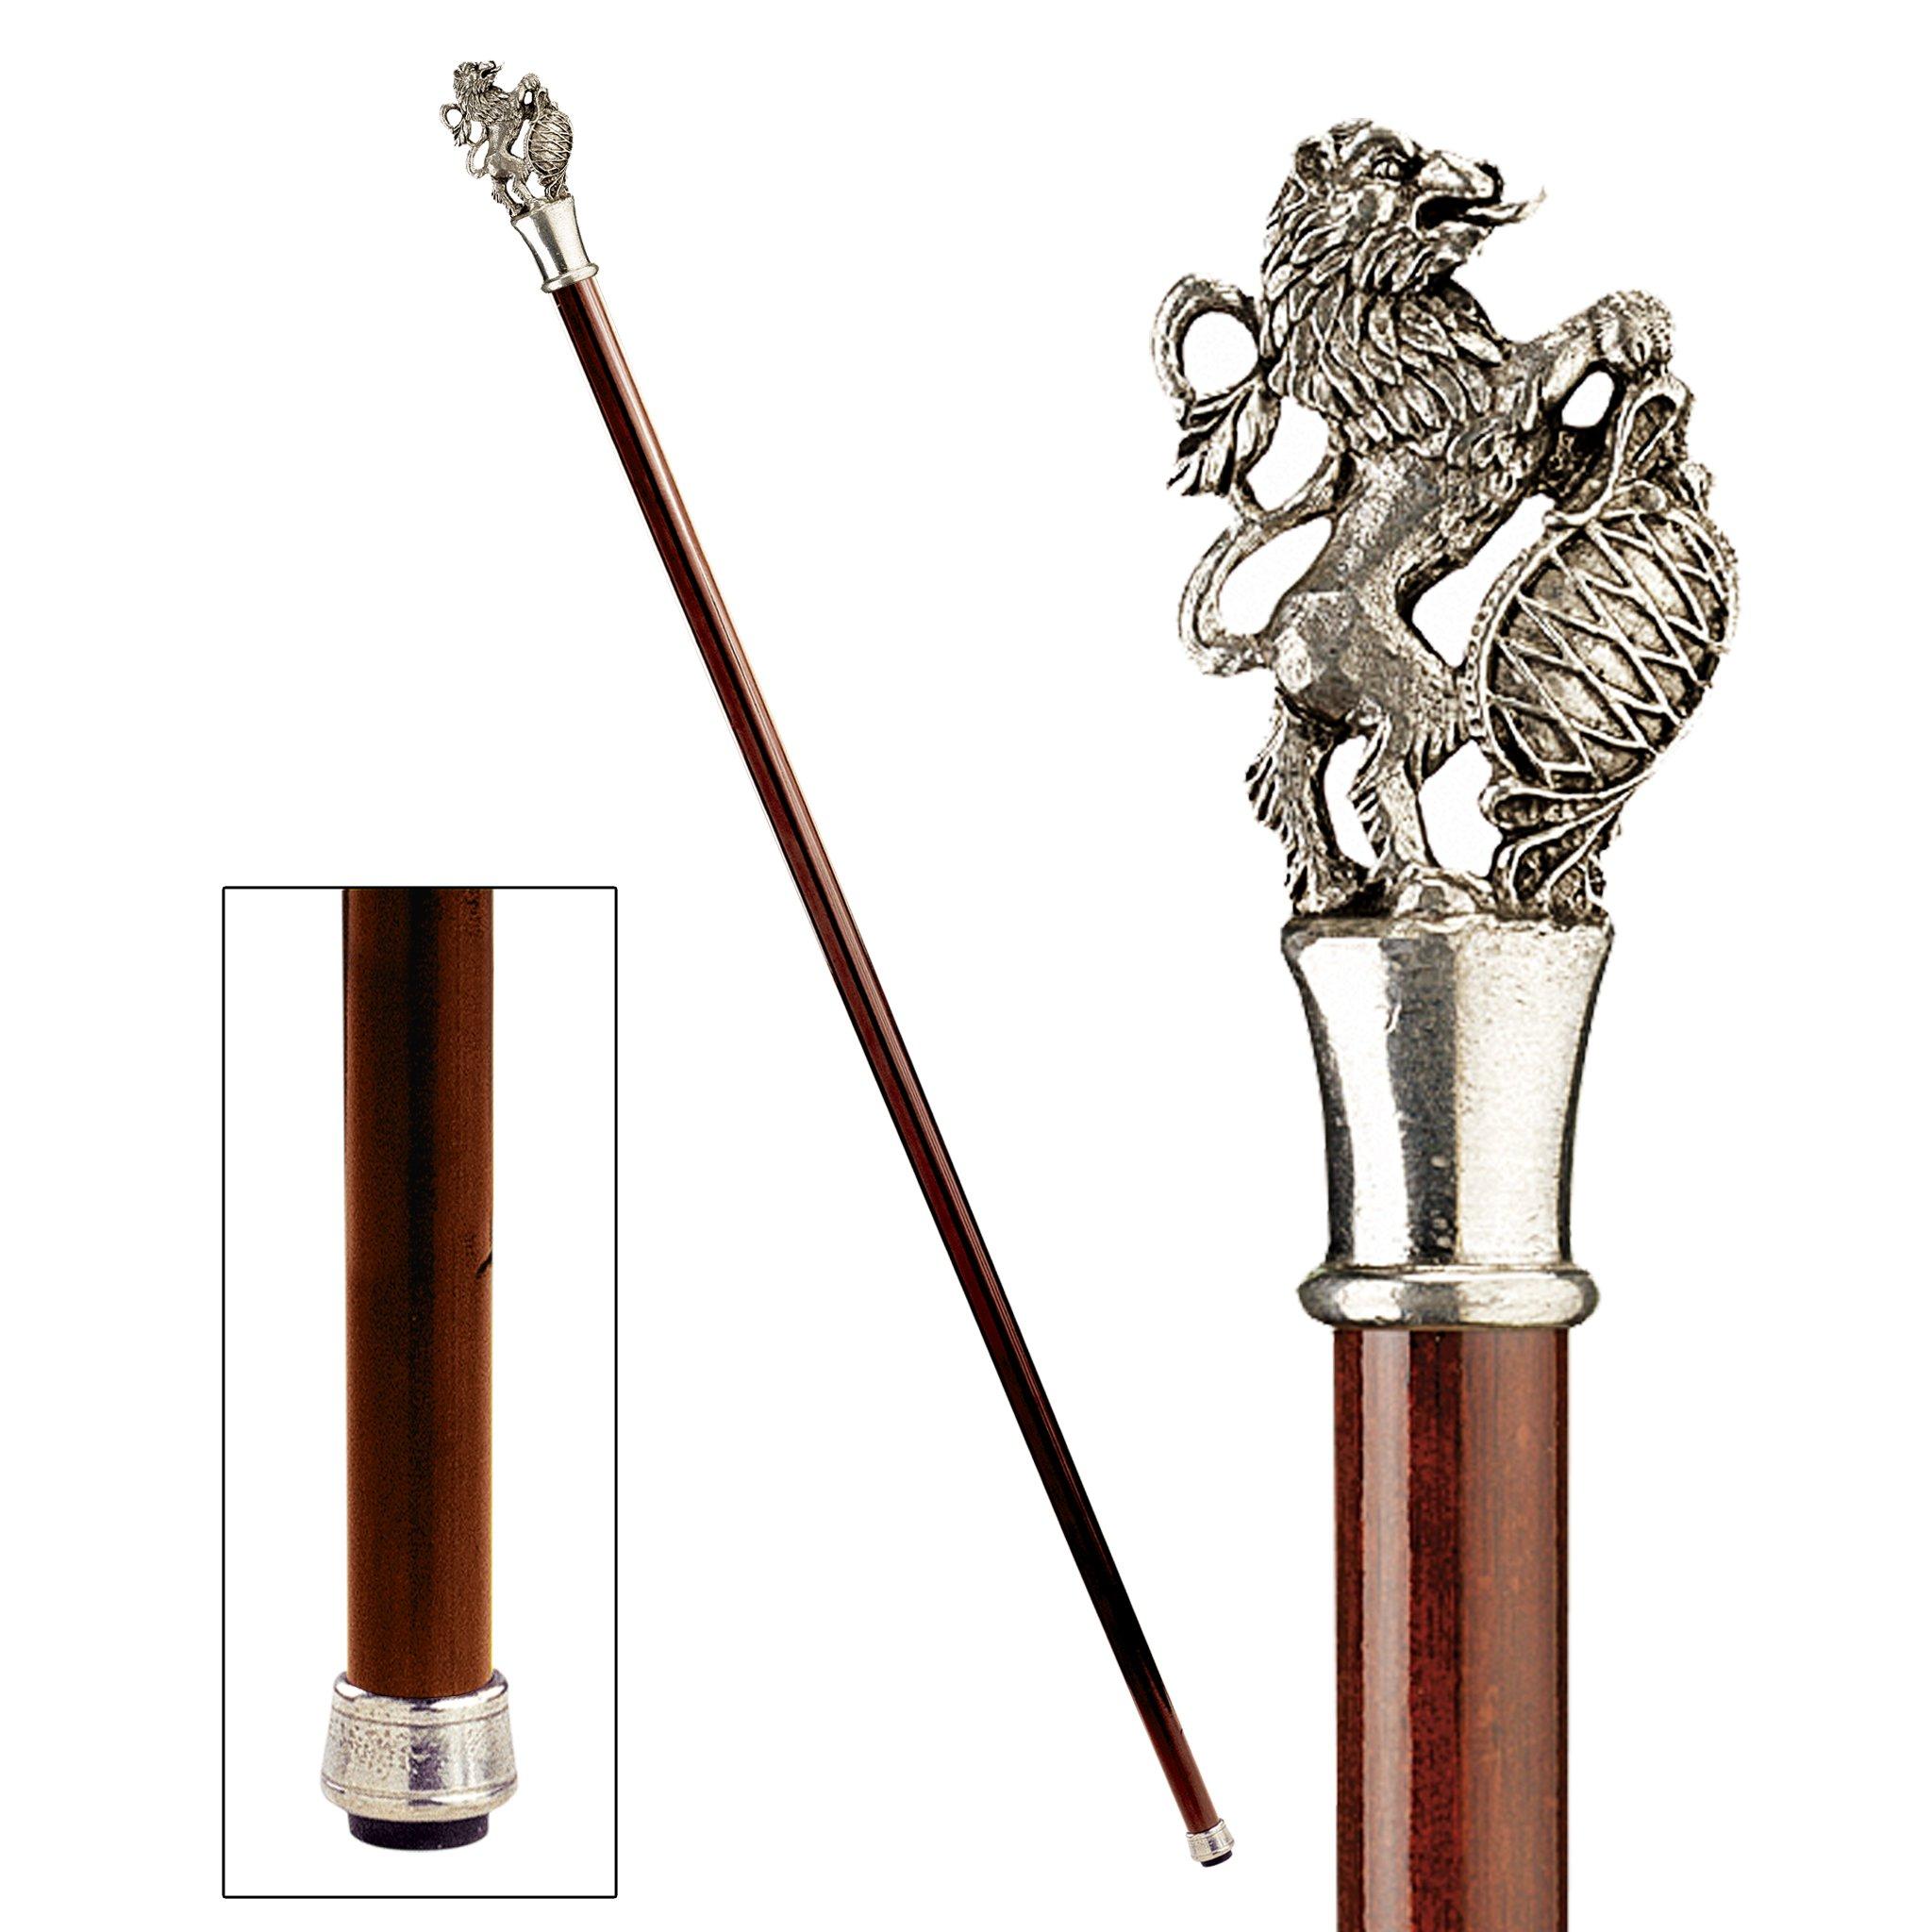 Design Toscano Heraldic Lion Walking Stick, 35 Inch, Pewter Handle and Hardwood Cane, Silver